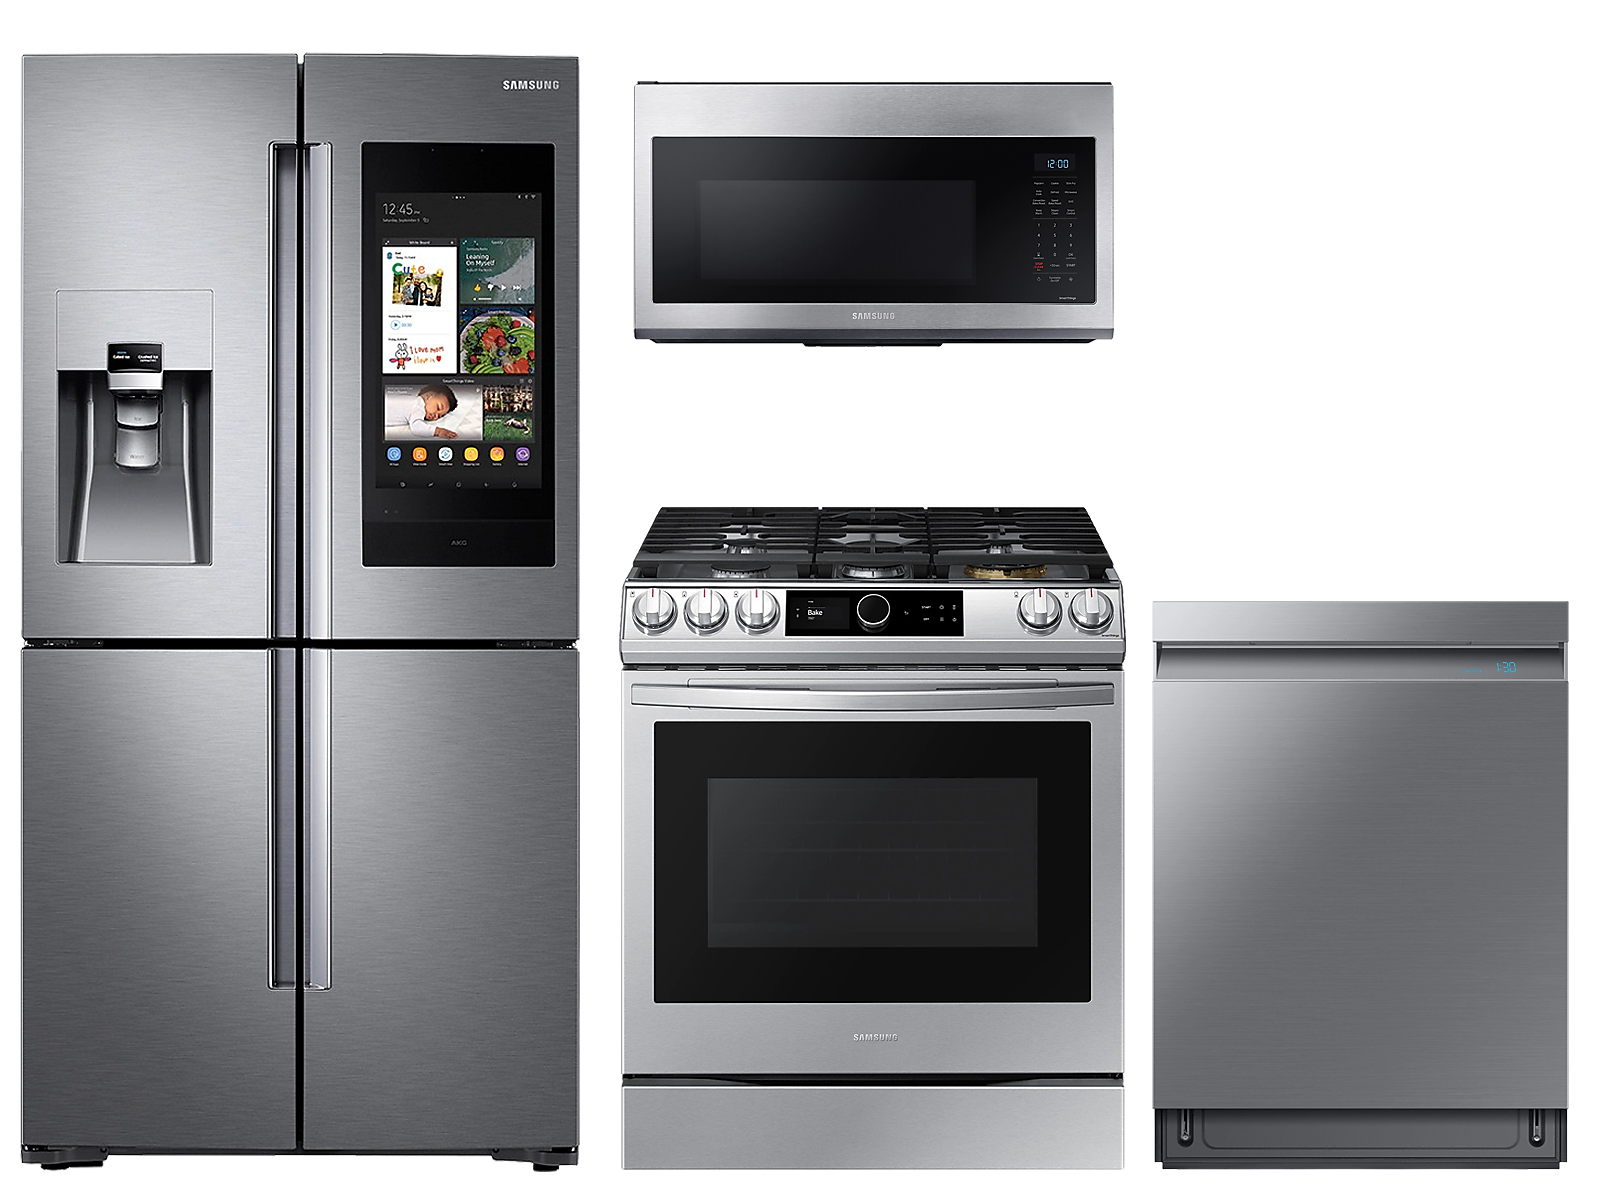 Samsung coupon: Samsung 22 cu. ft. Family HubTM counter depth 4-door refrigerator, gas range, microwave and Smart Linear dishwasher package(BNDL-1614702835384)